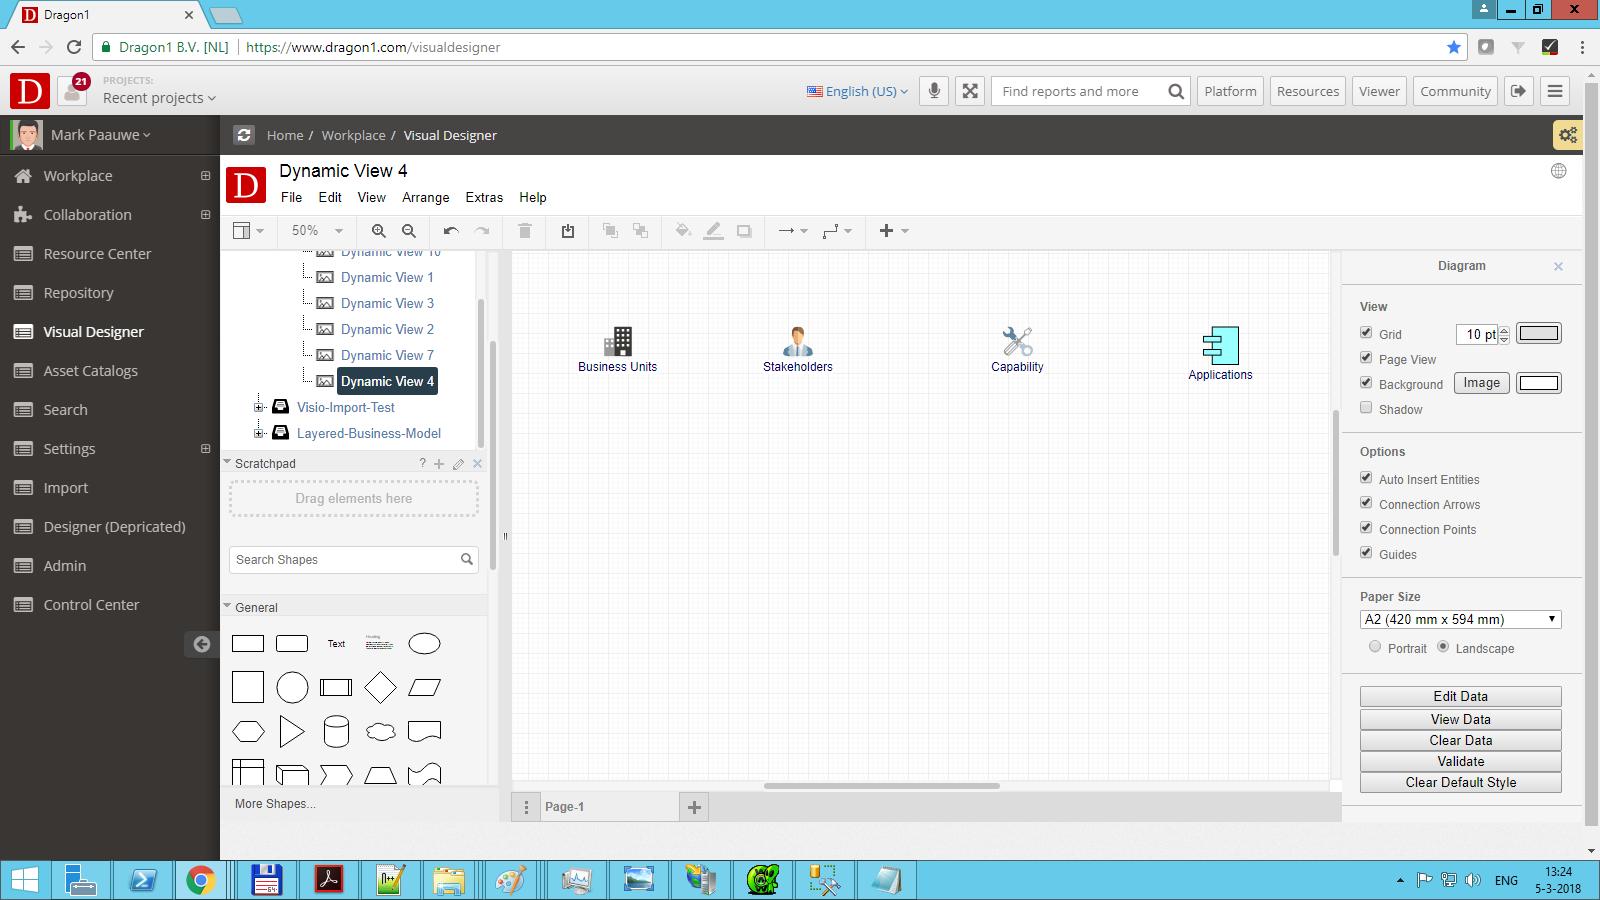 dragon1 select visualization in folder